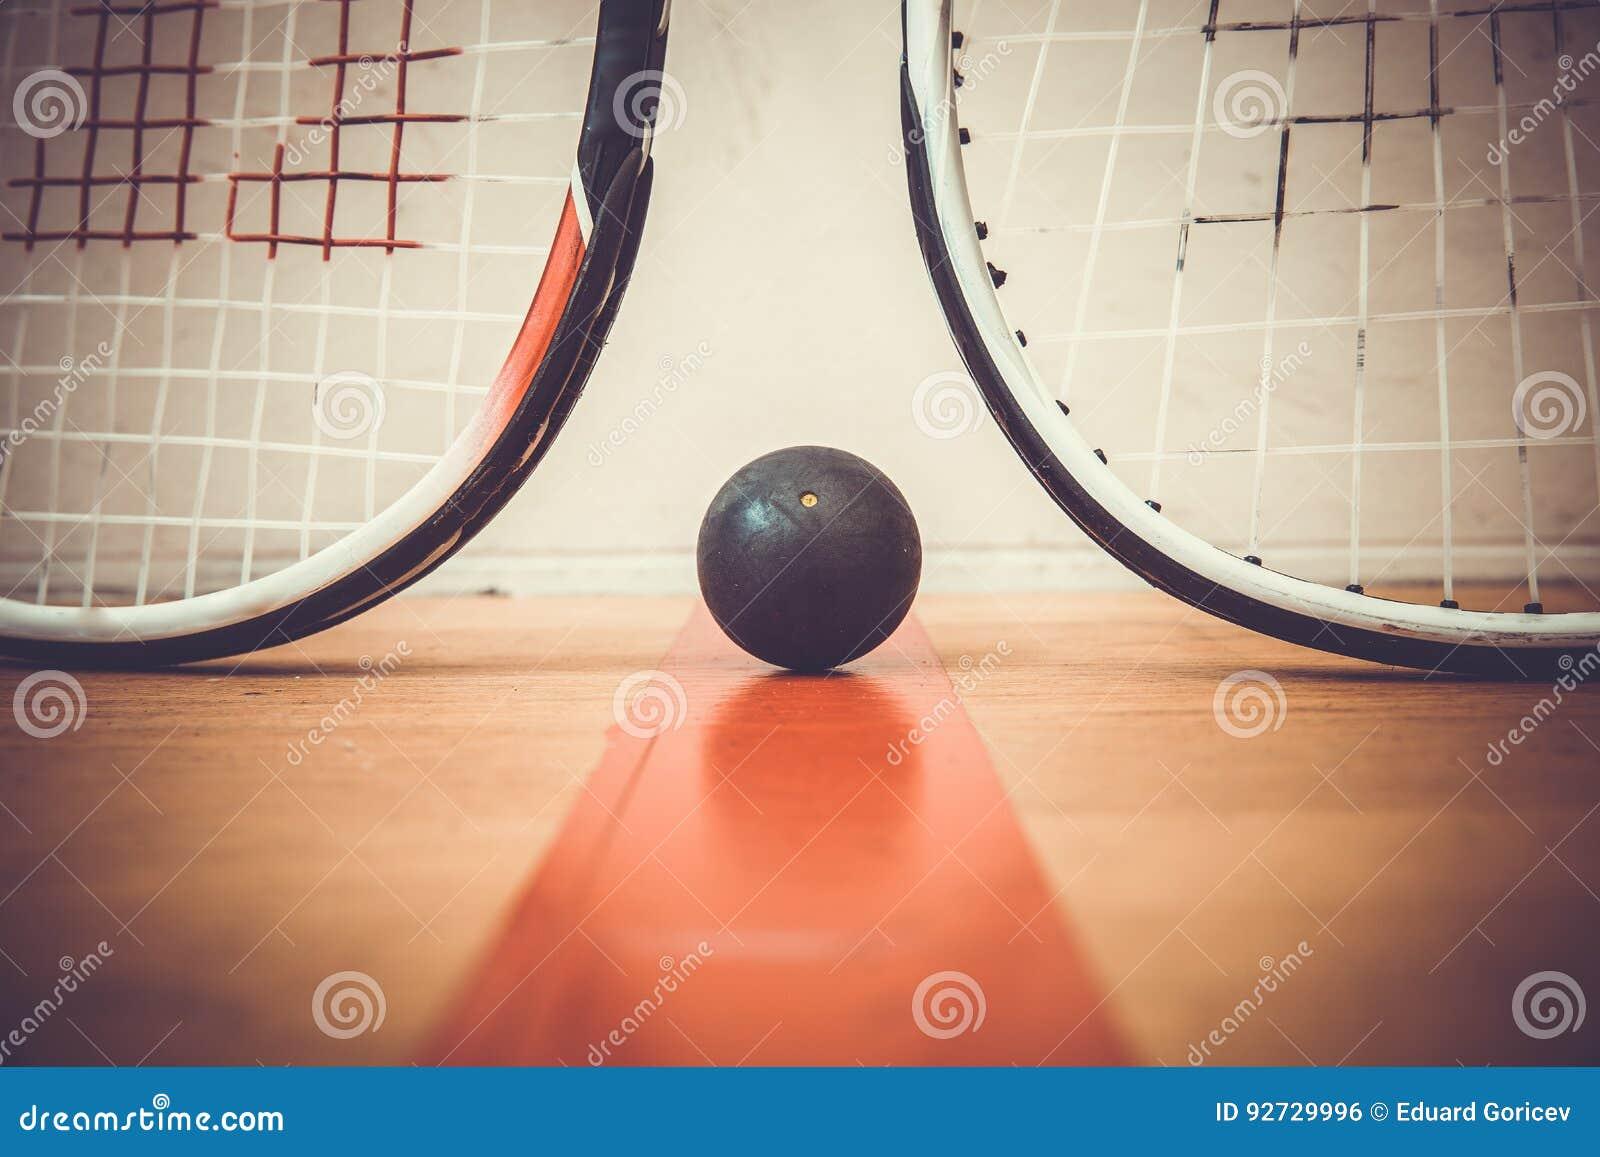 Squash ball between two squash rackets